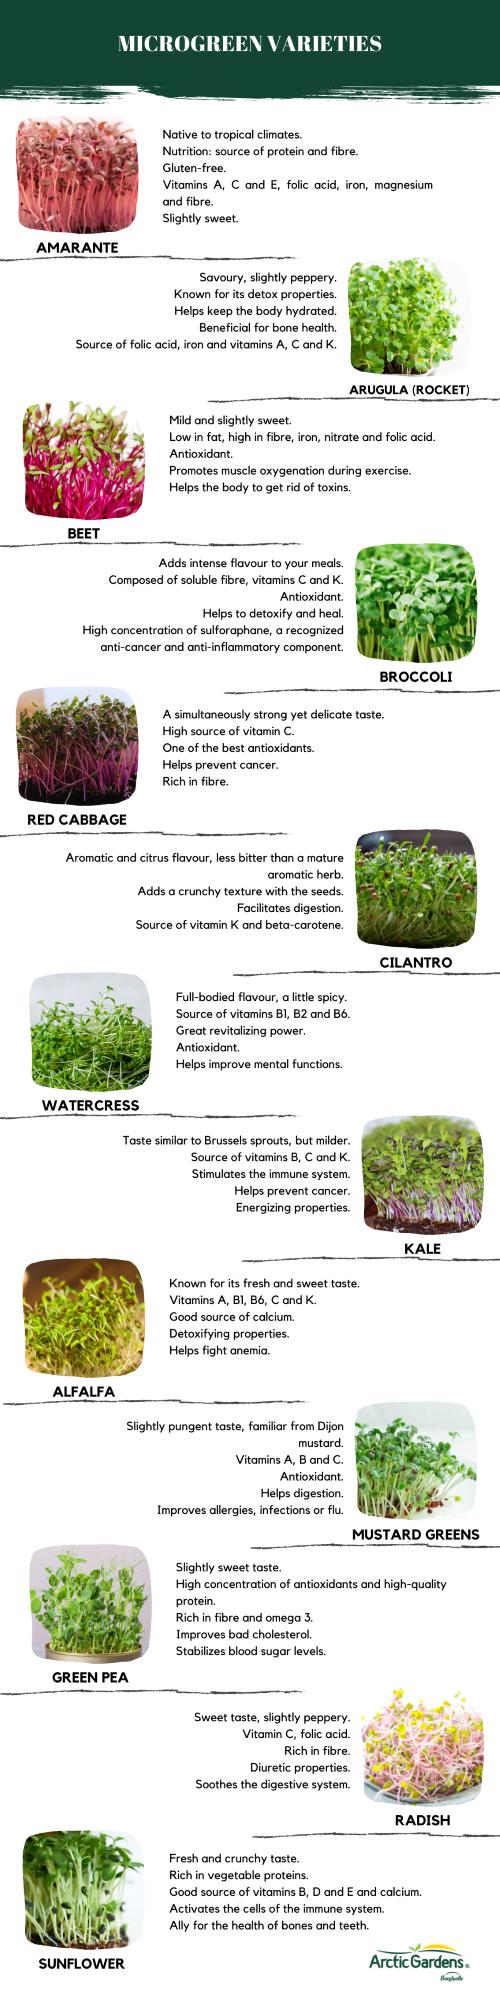 microgreen-varieties